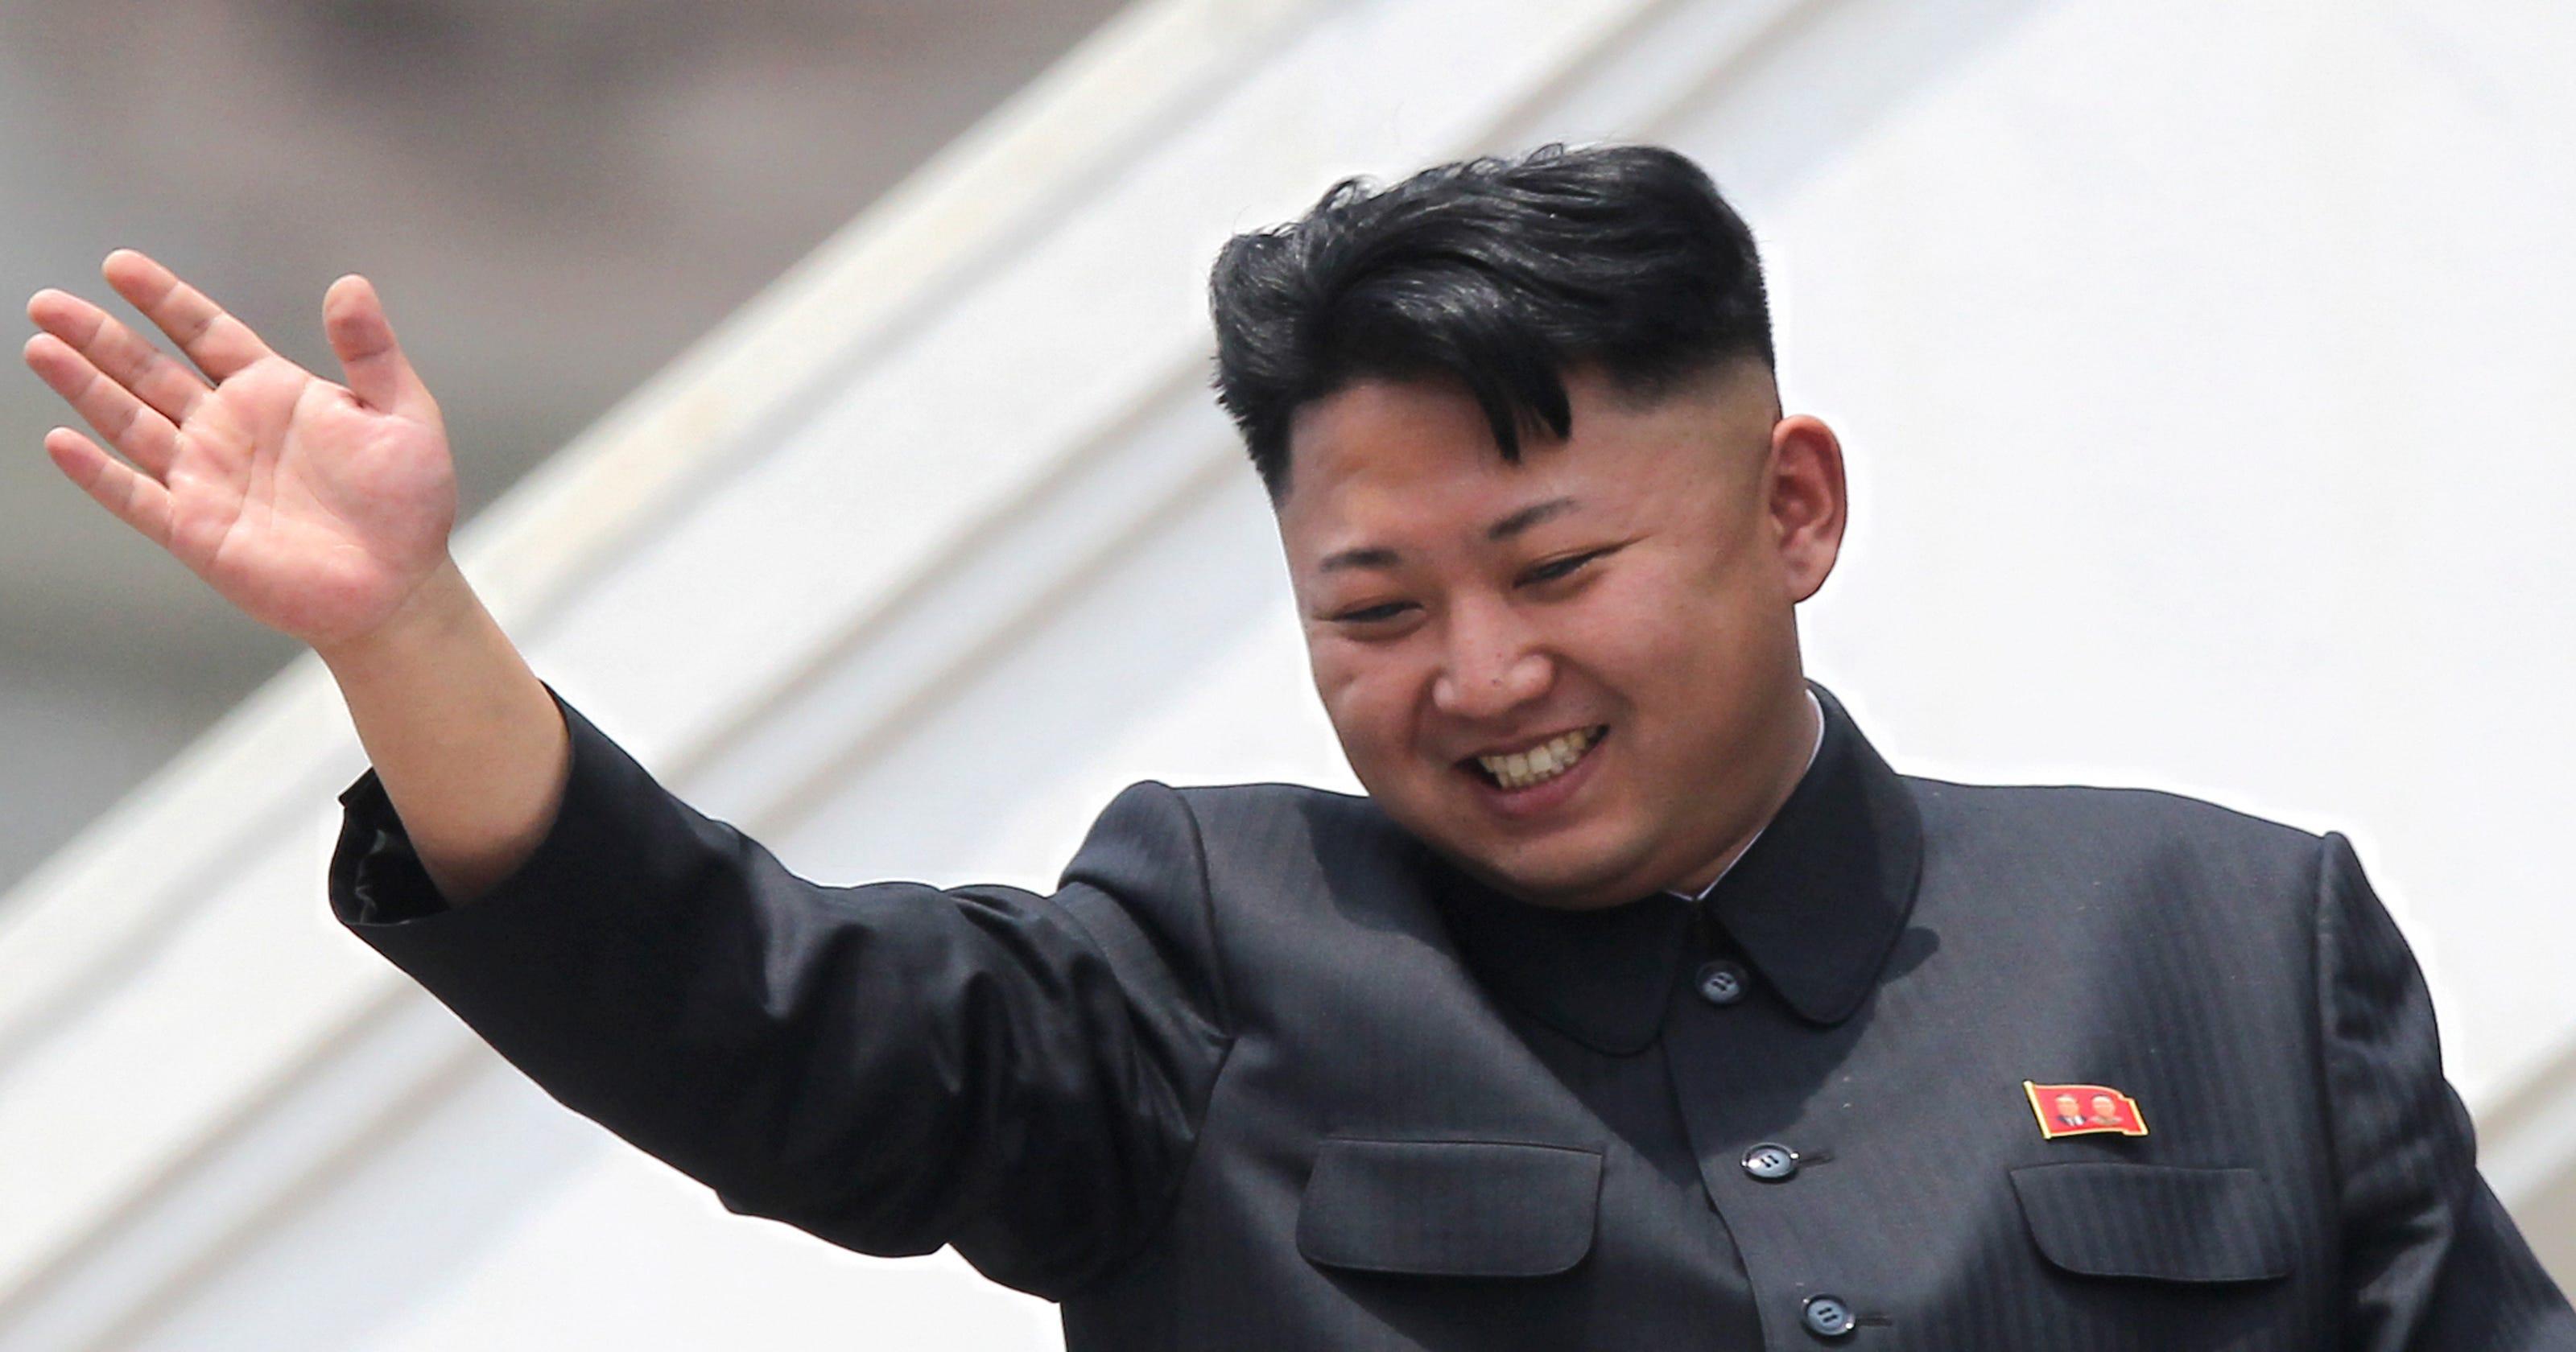 North Korean Haircut Mandate Likely Untrue